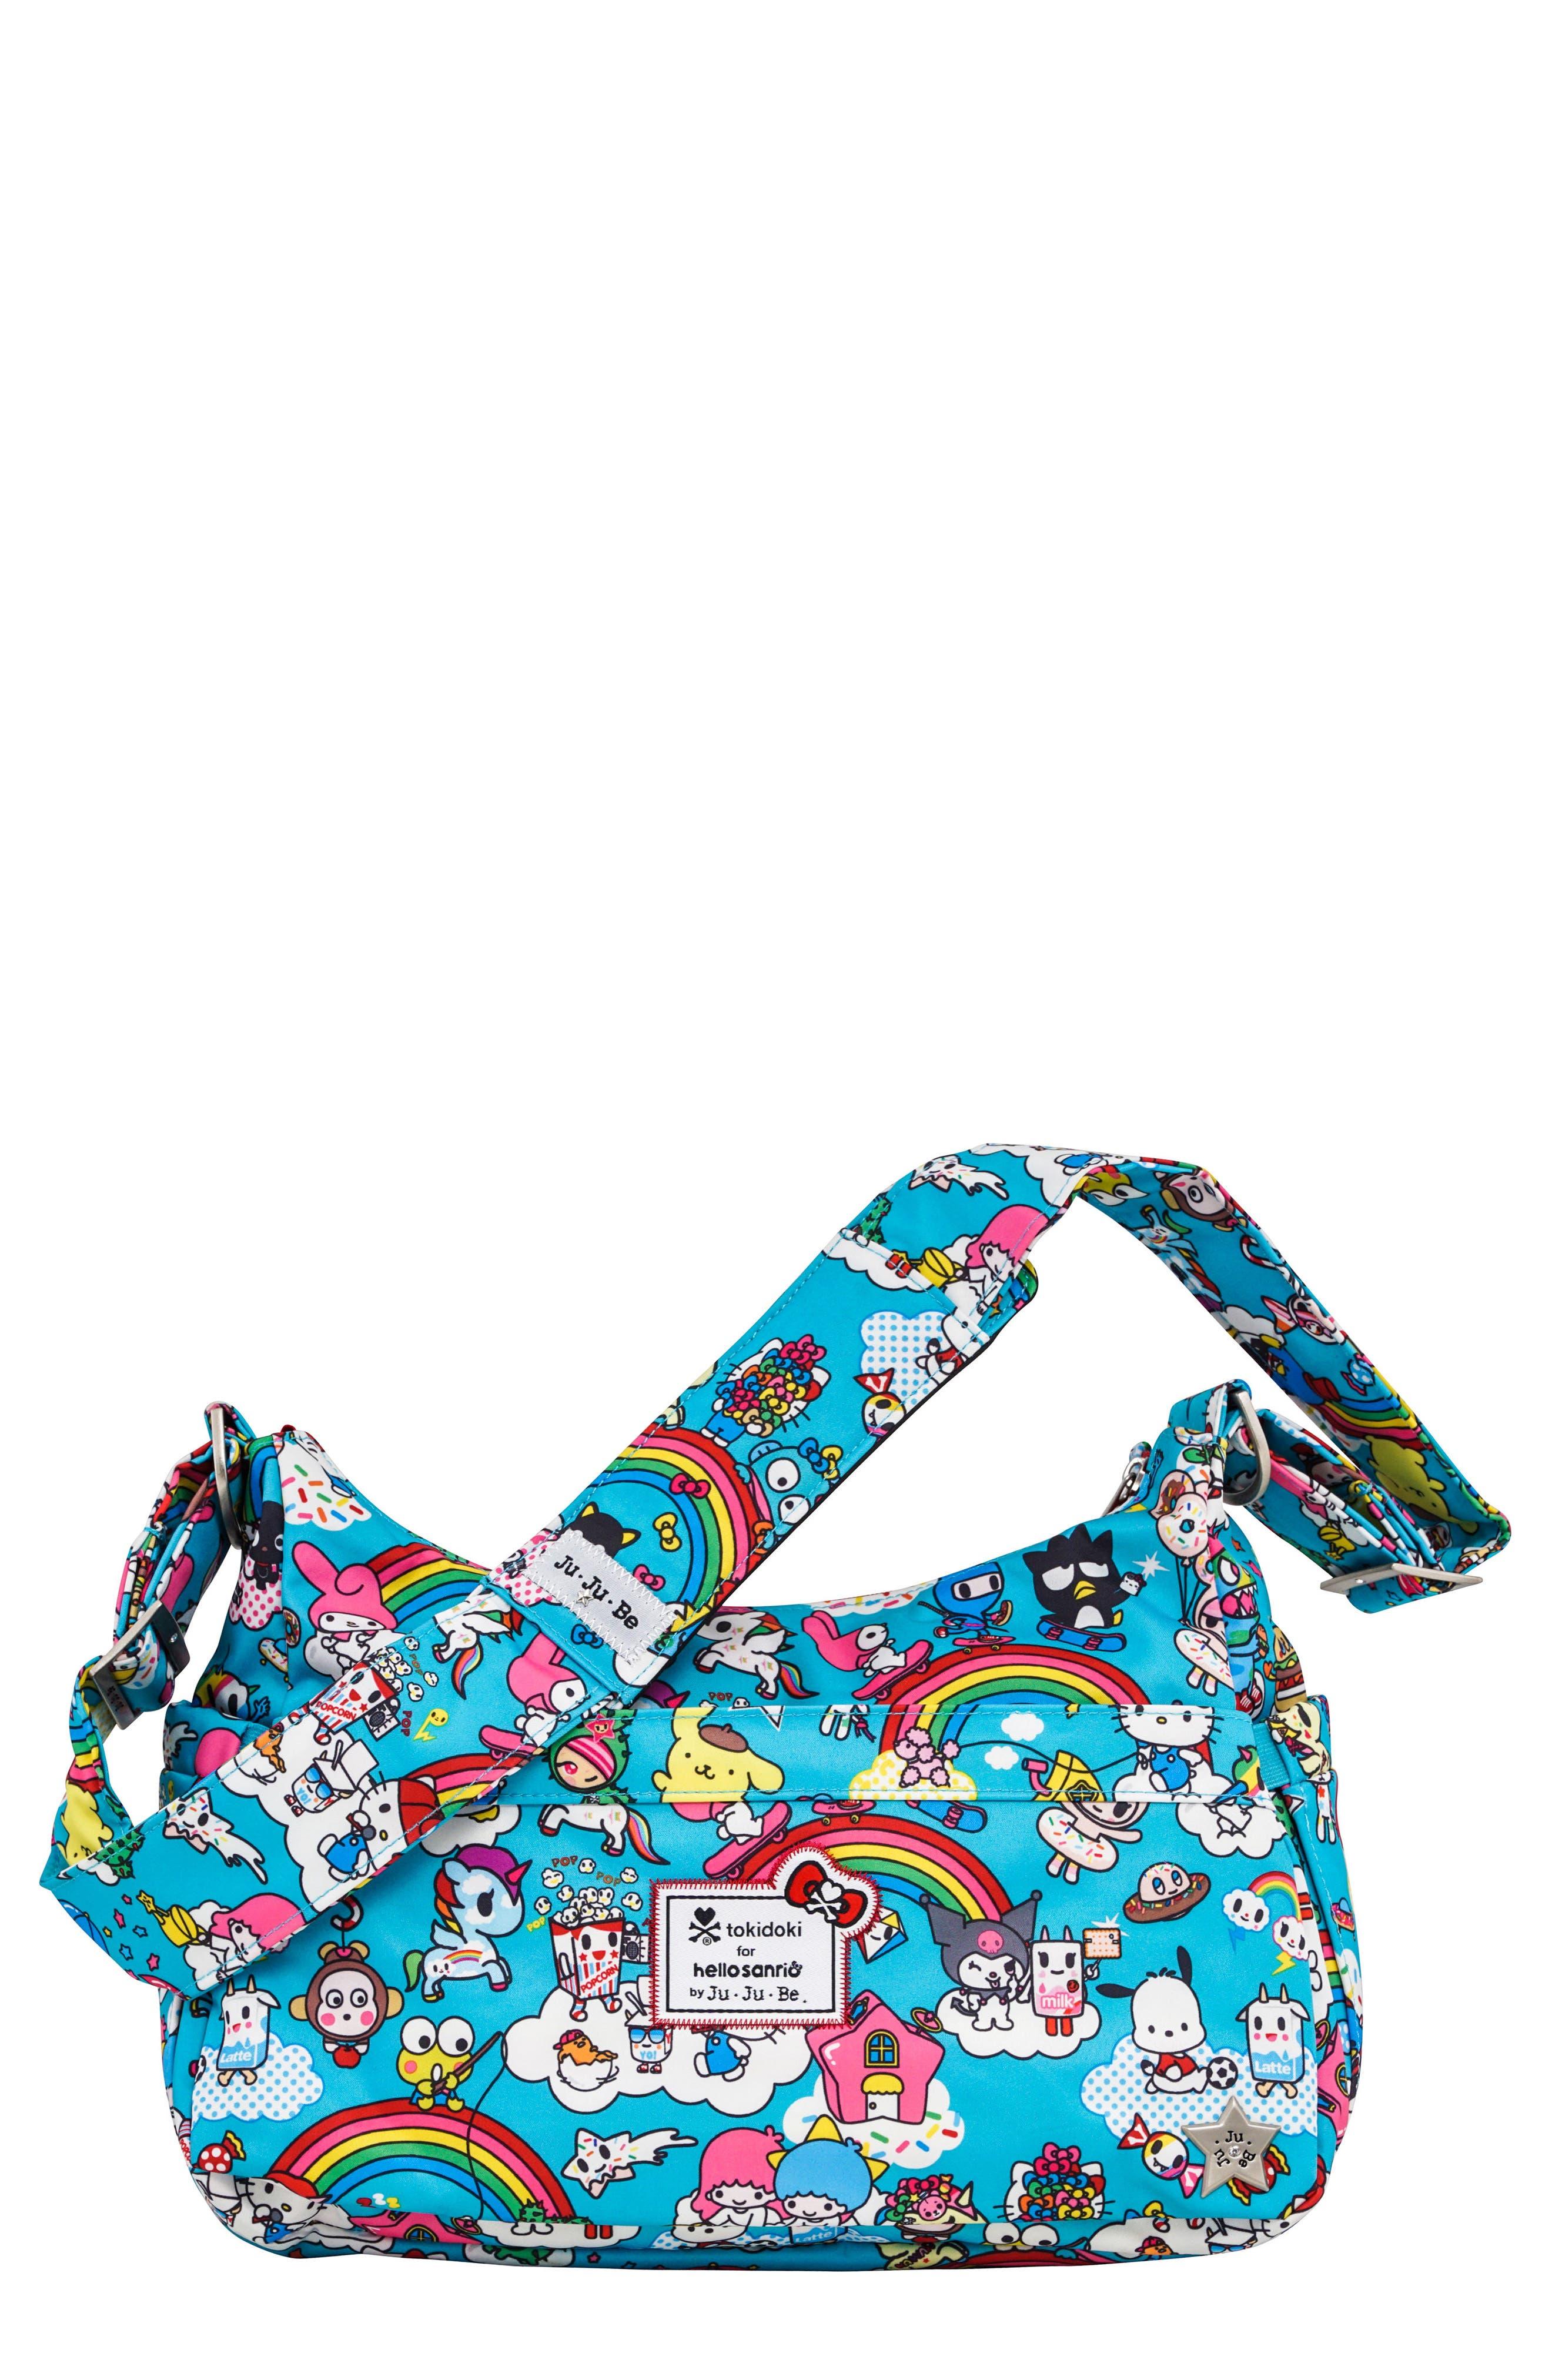 Ju-Ju-Be x tokidoki for Hello Sanrio Rainbow Dreams Be Hobo Diaper Bag